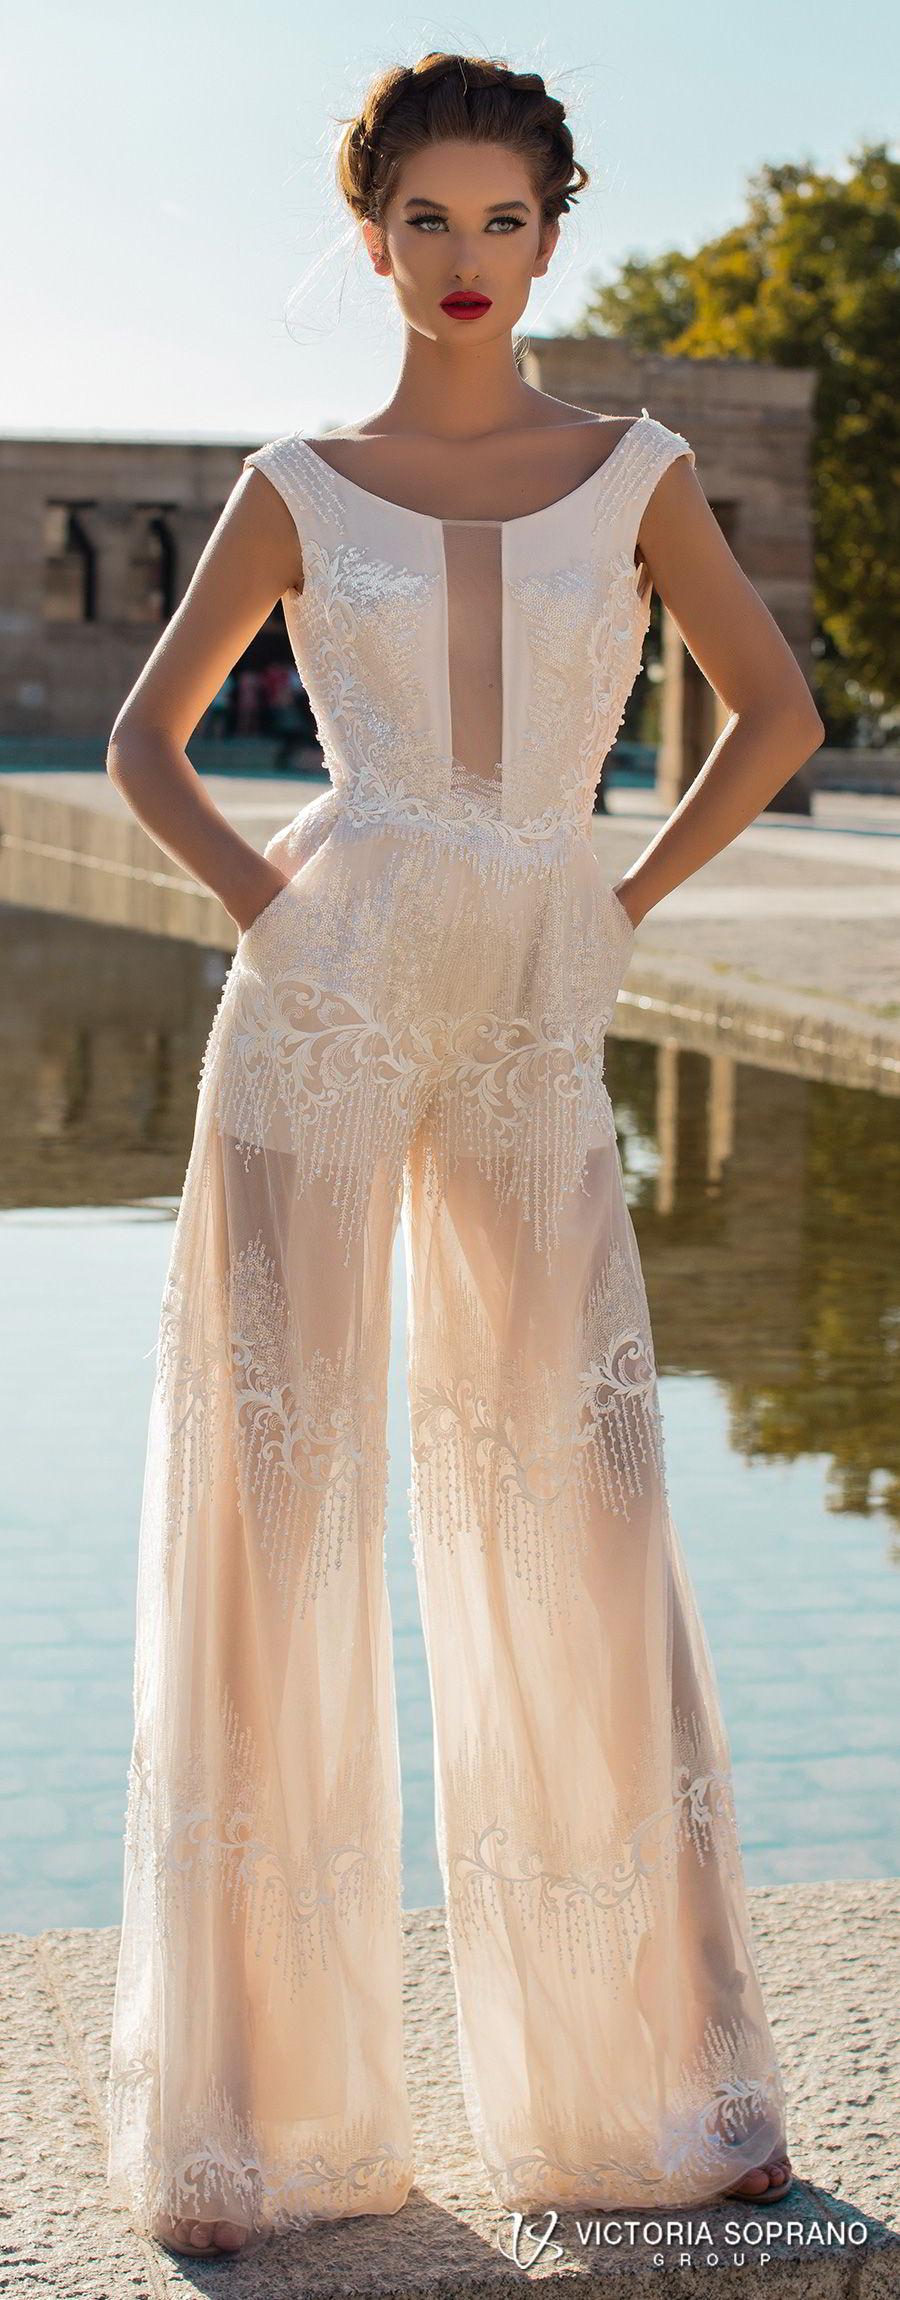 victoria soprano 2018 bridal cap sleeves bateau neckline full embellishment modern champagne color pants wedding dress with pockets v back chapel cape train (emma) lv